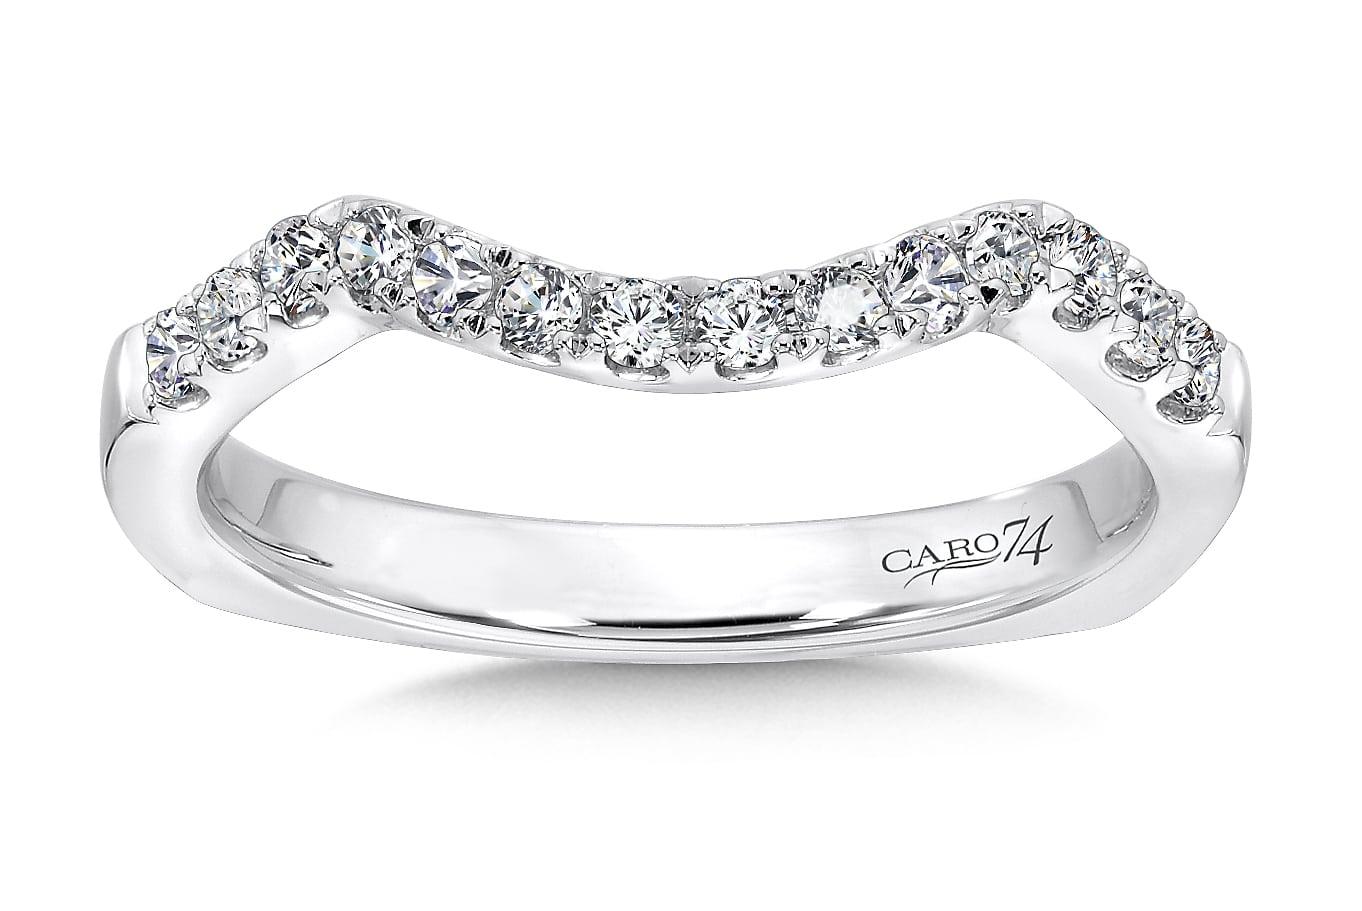 Wholesale Custom Engagement Rings In Dallas 1 1, Shira Diamonds